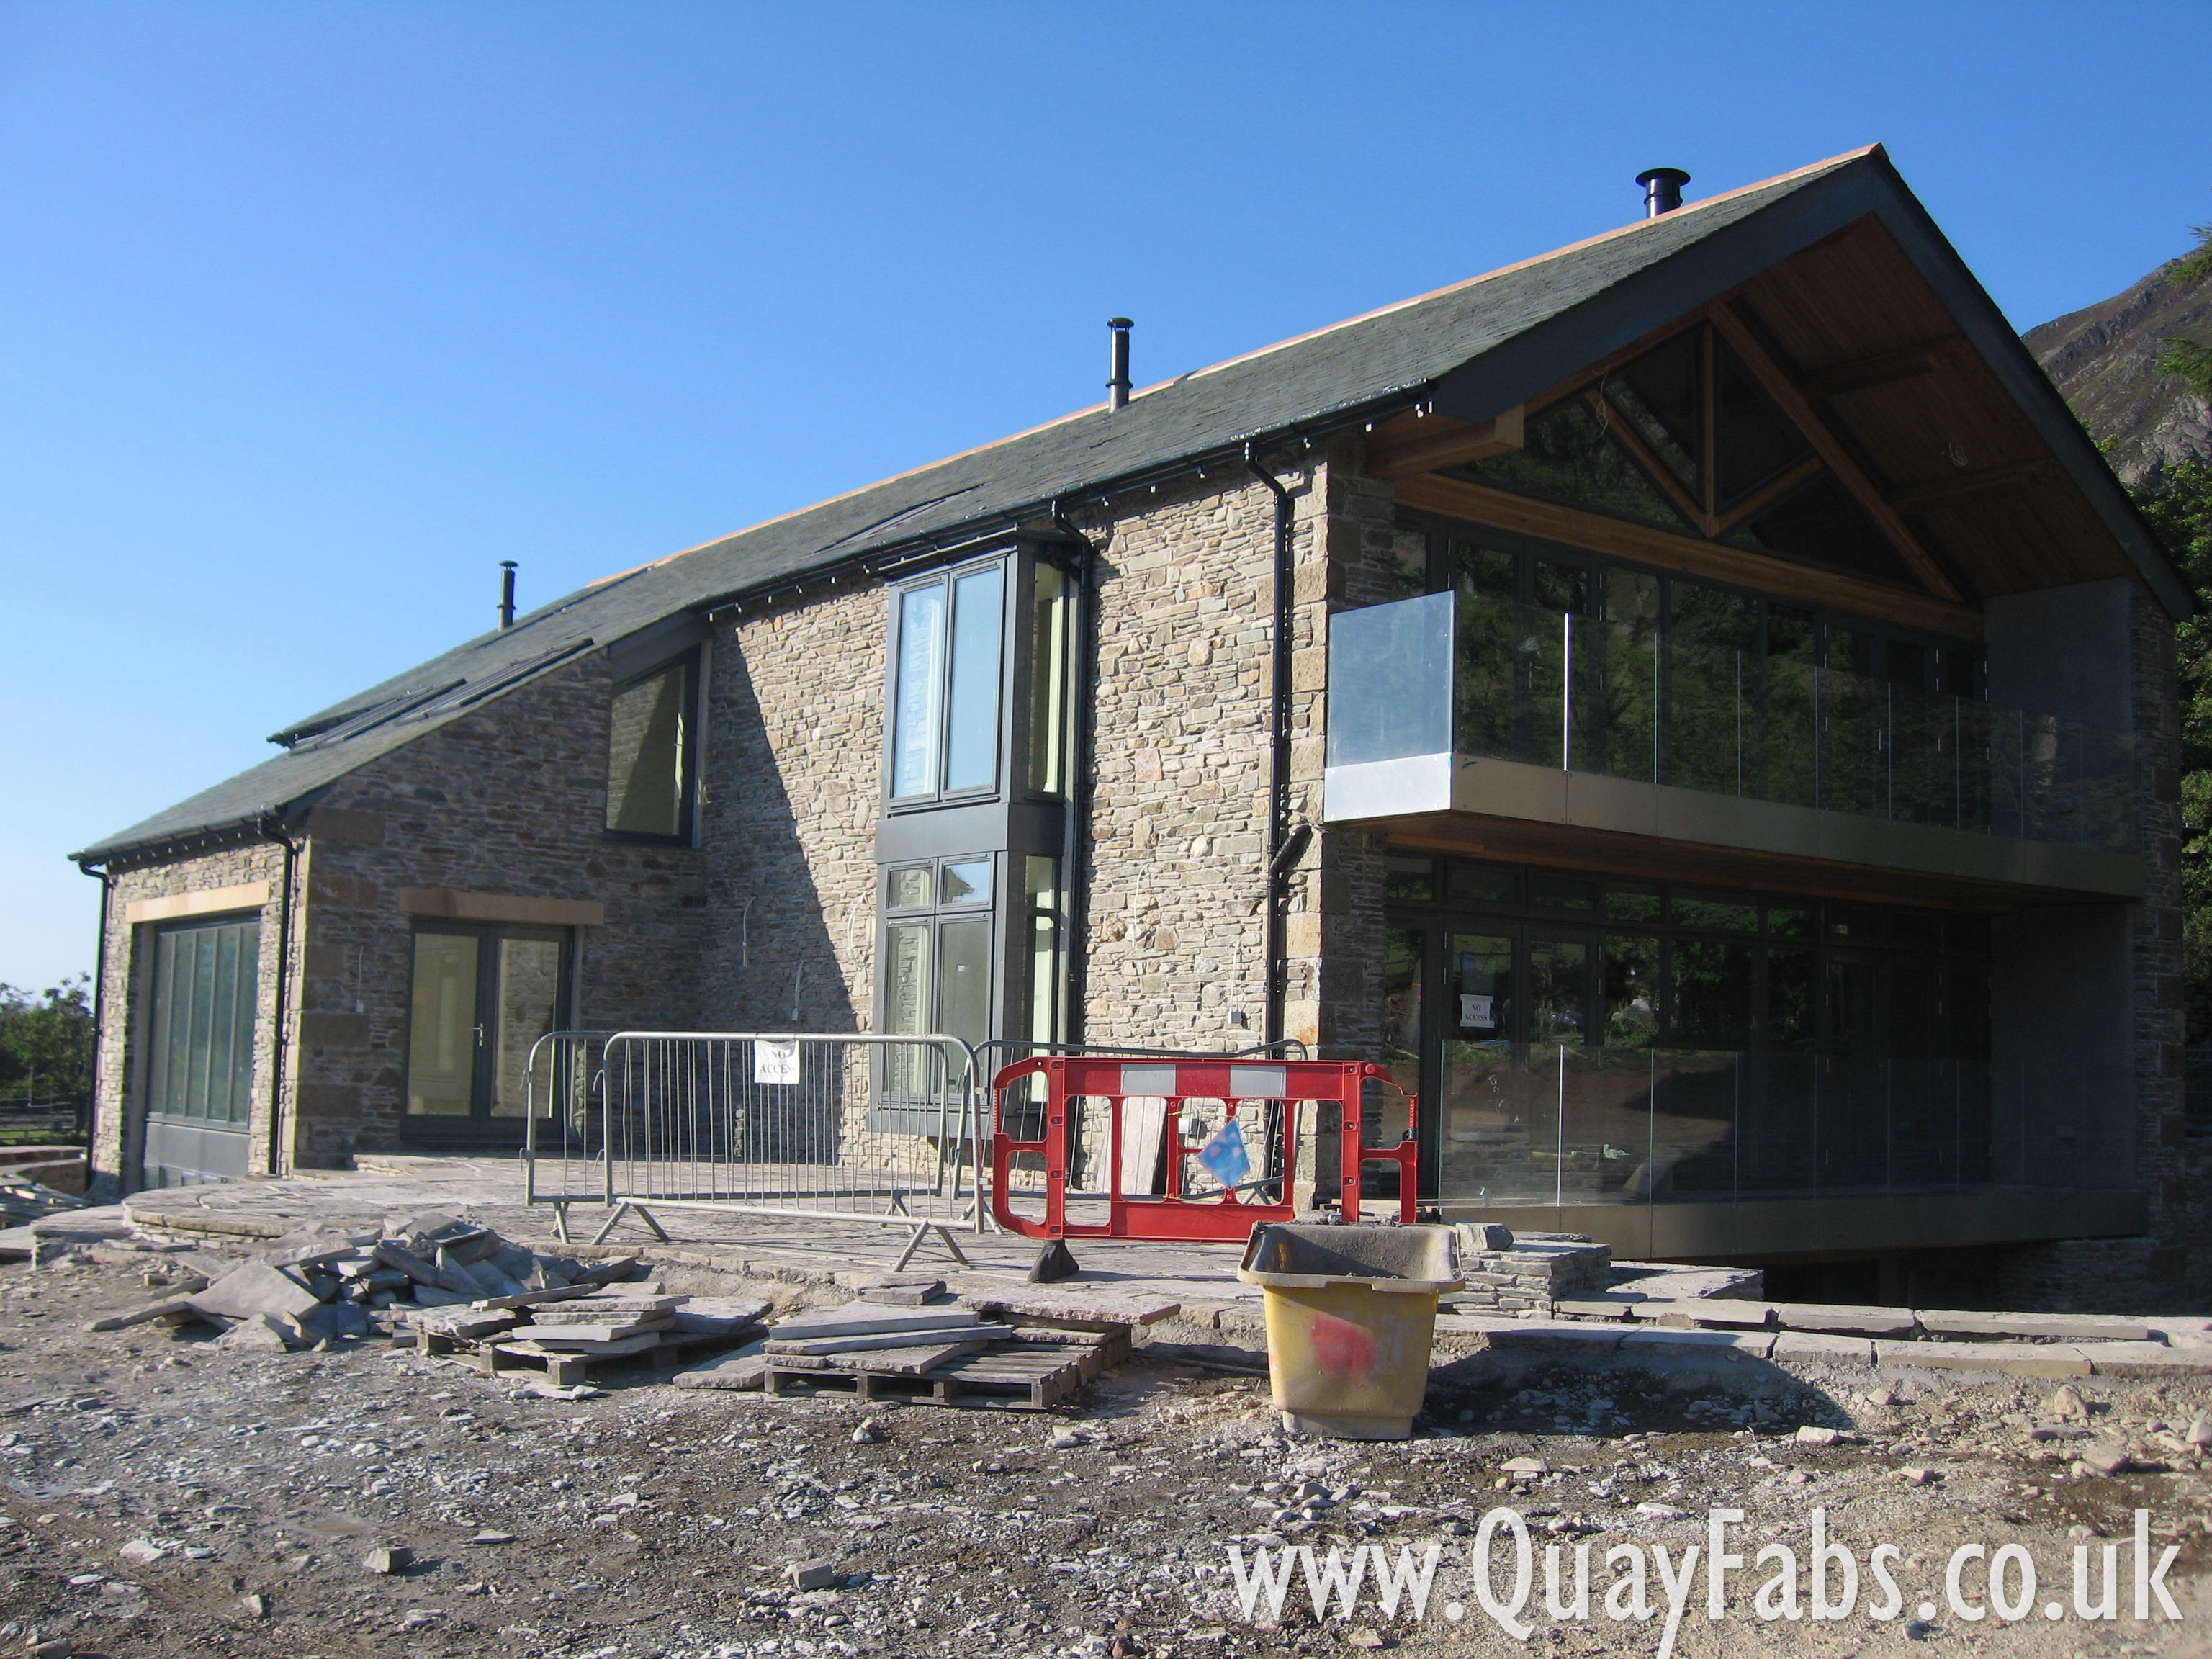 Quay Fabrications Lancaster Balcony (29)